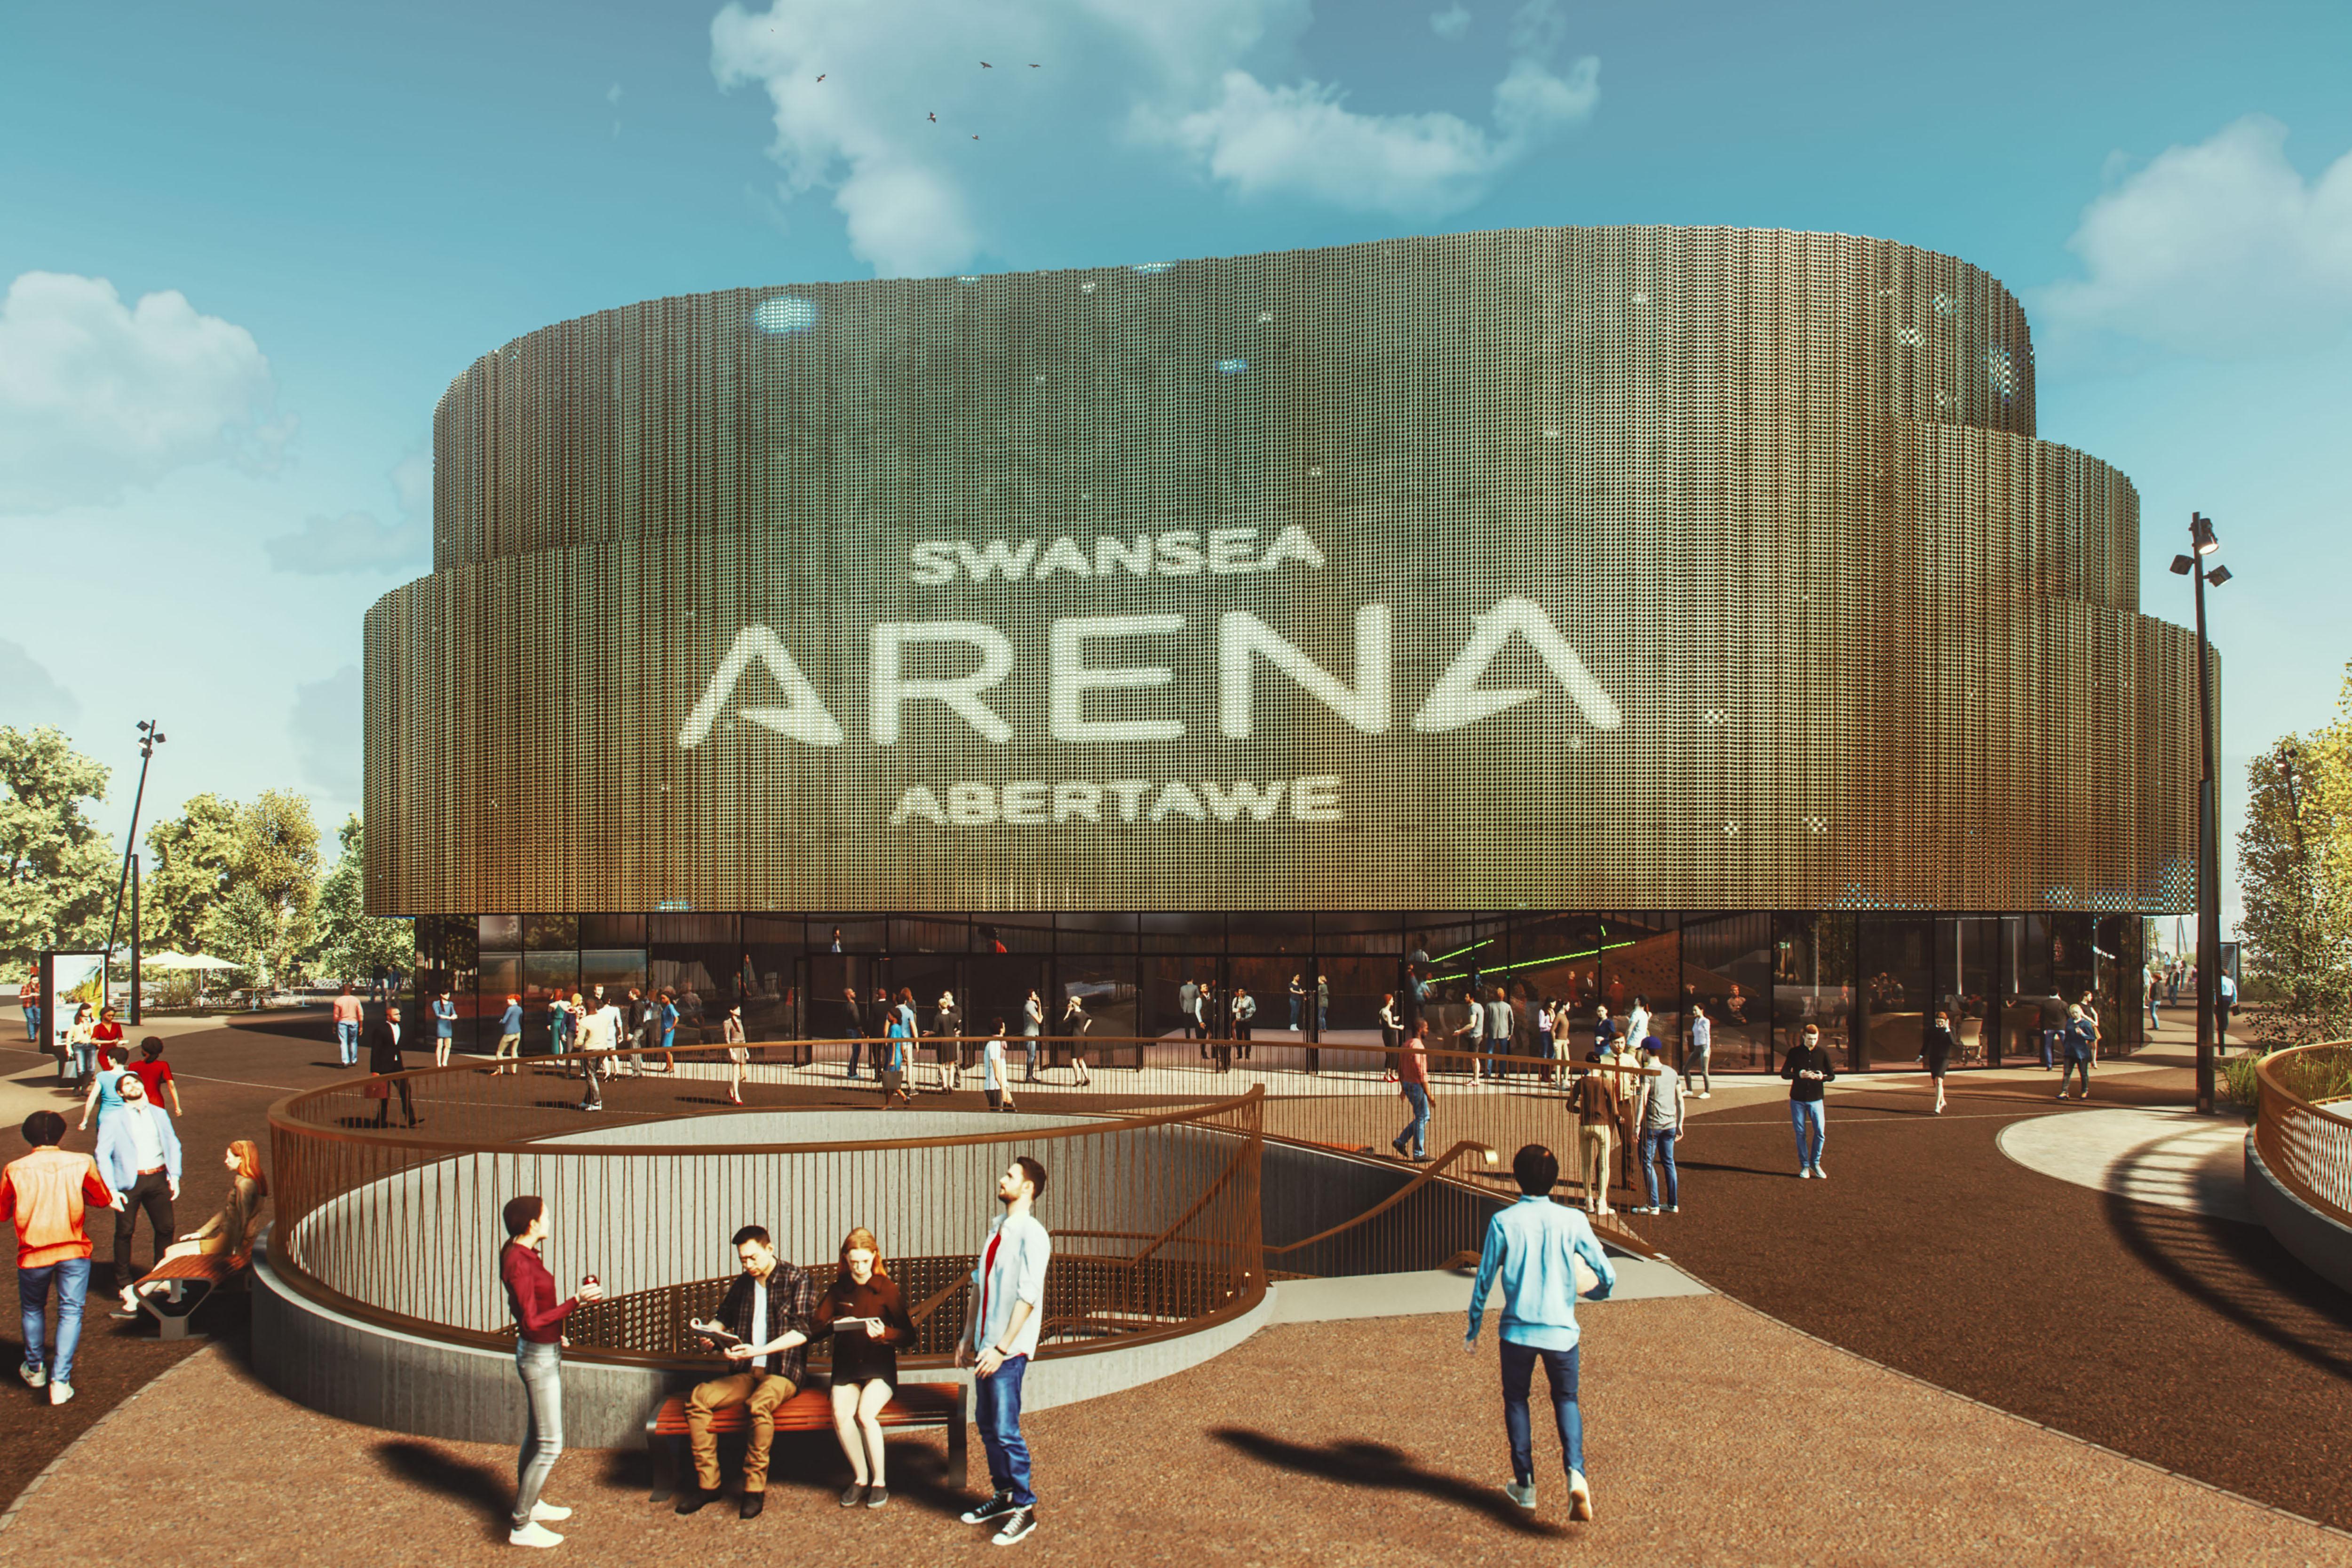 Swansea Arena